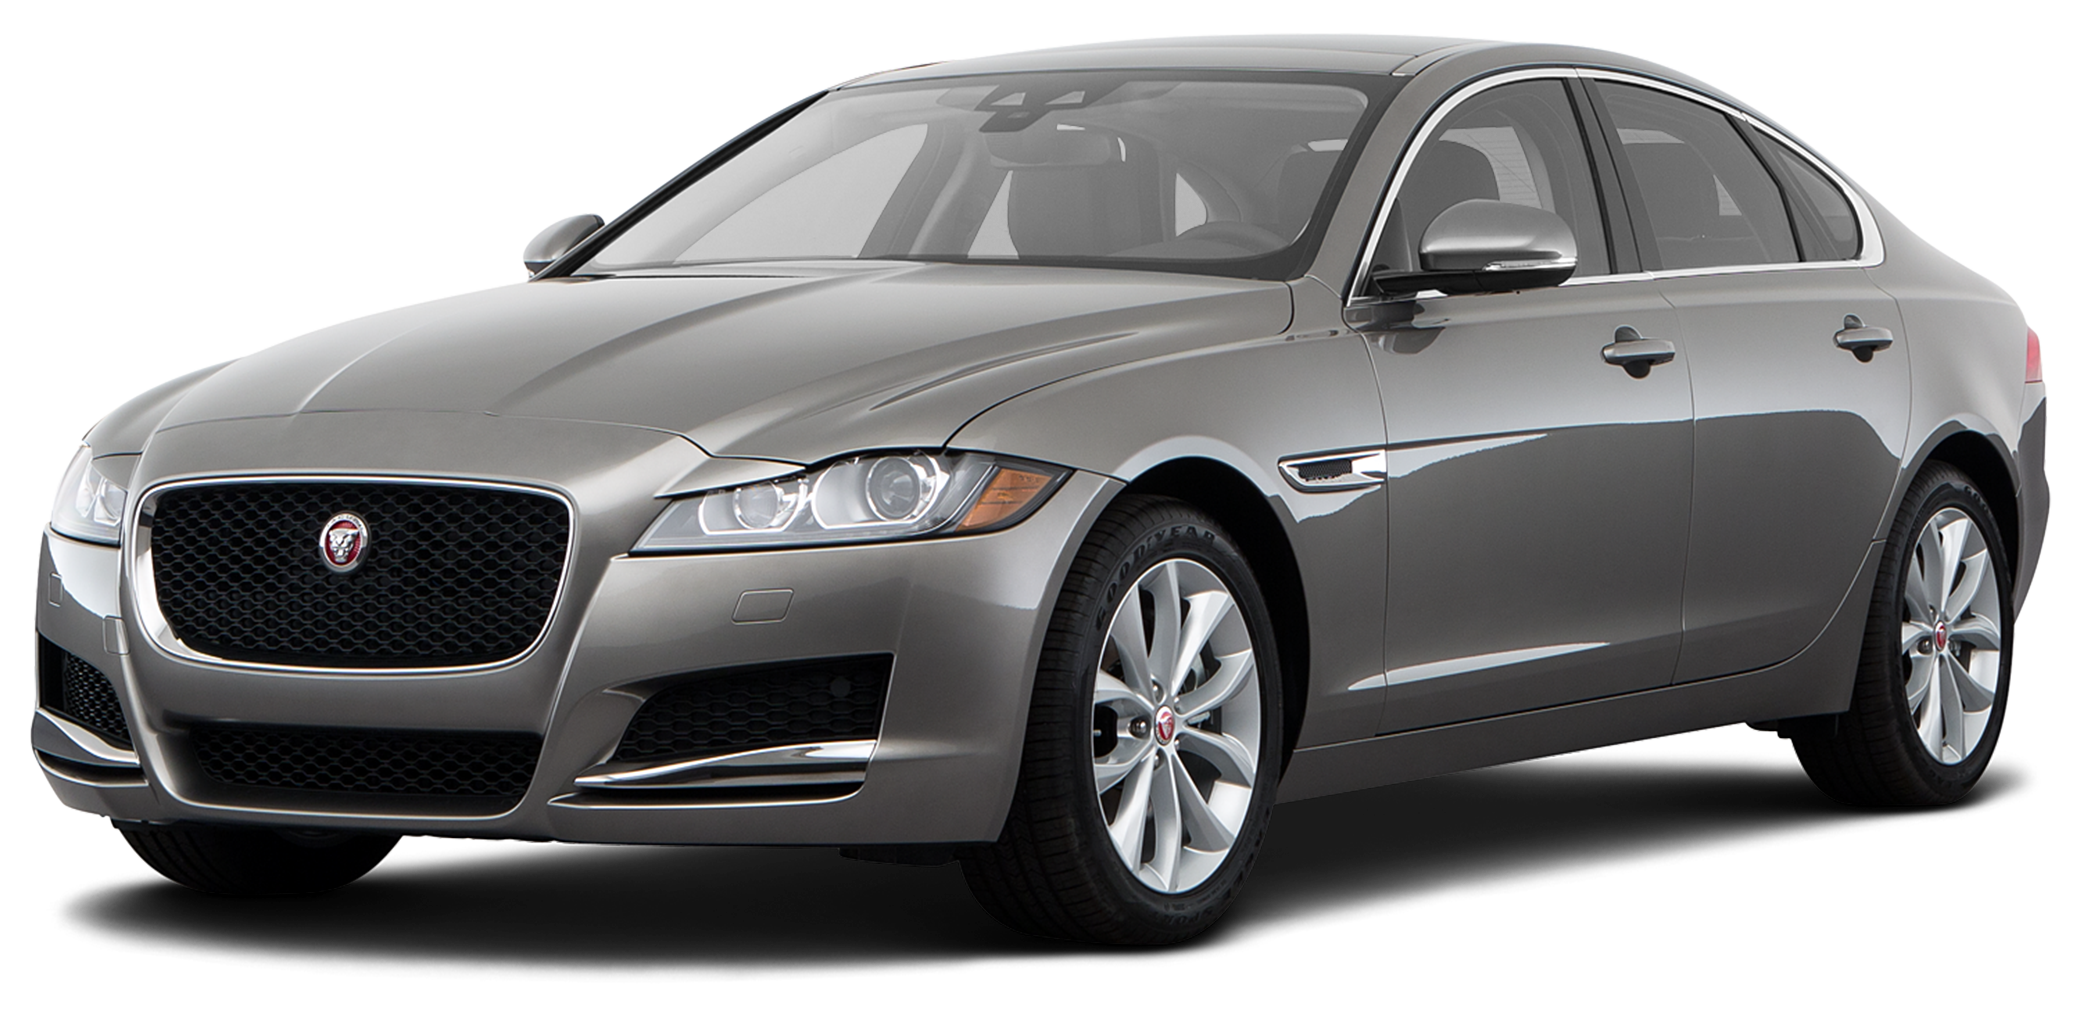 2019 jaguar xf incentives  specials  u0026 offers in fort lauderdale fl